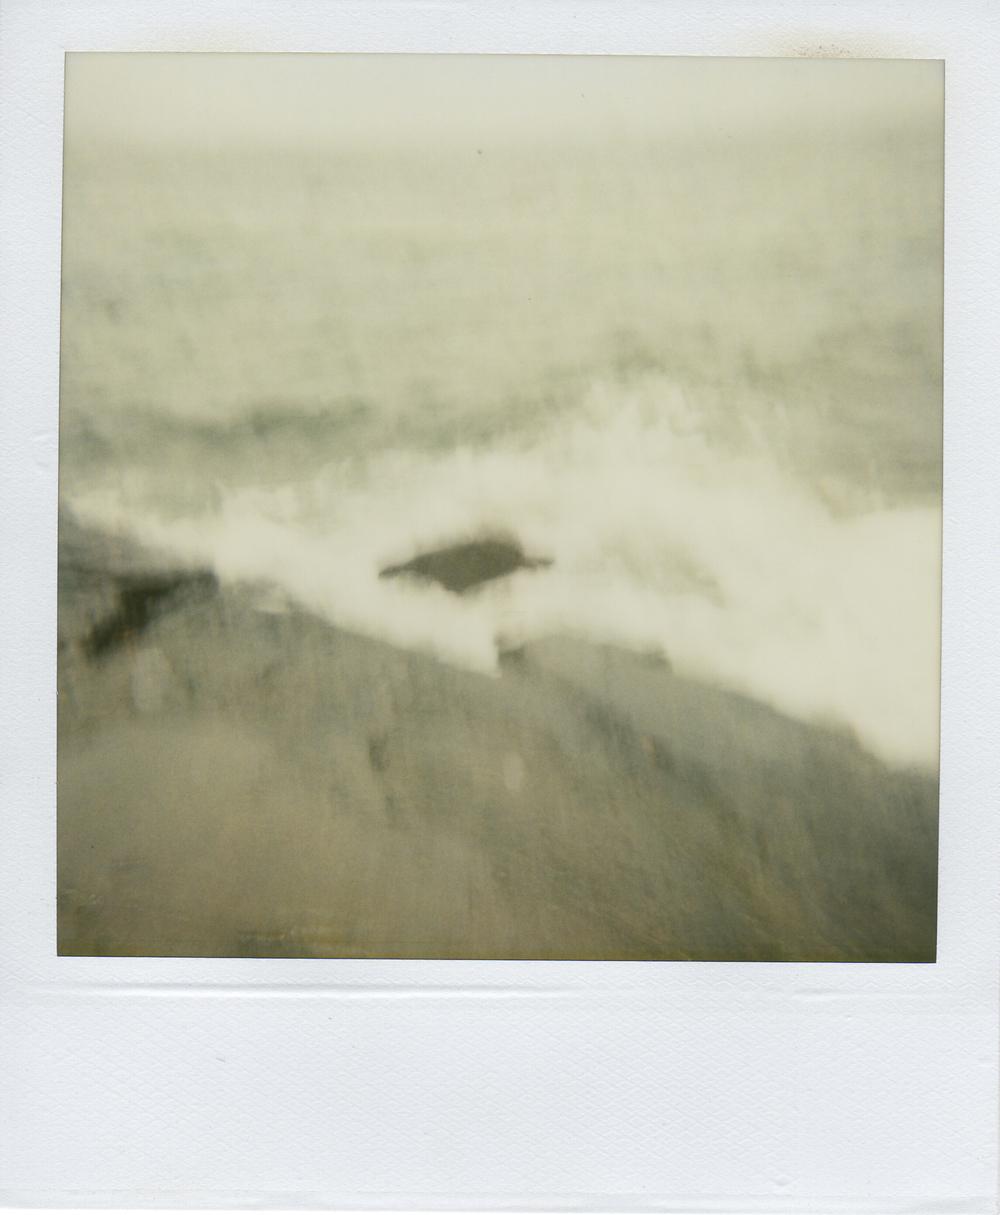 jlaurence-polaroid-024.jpg